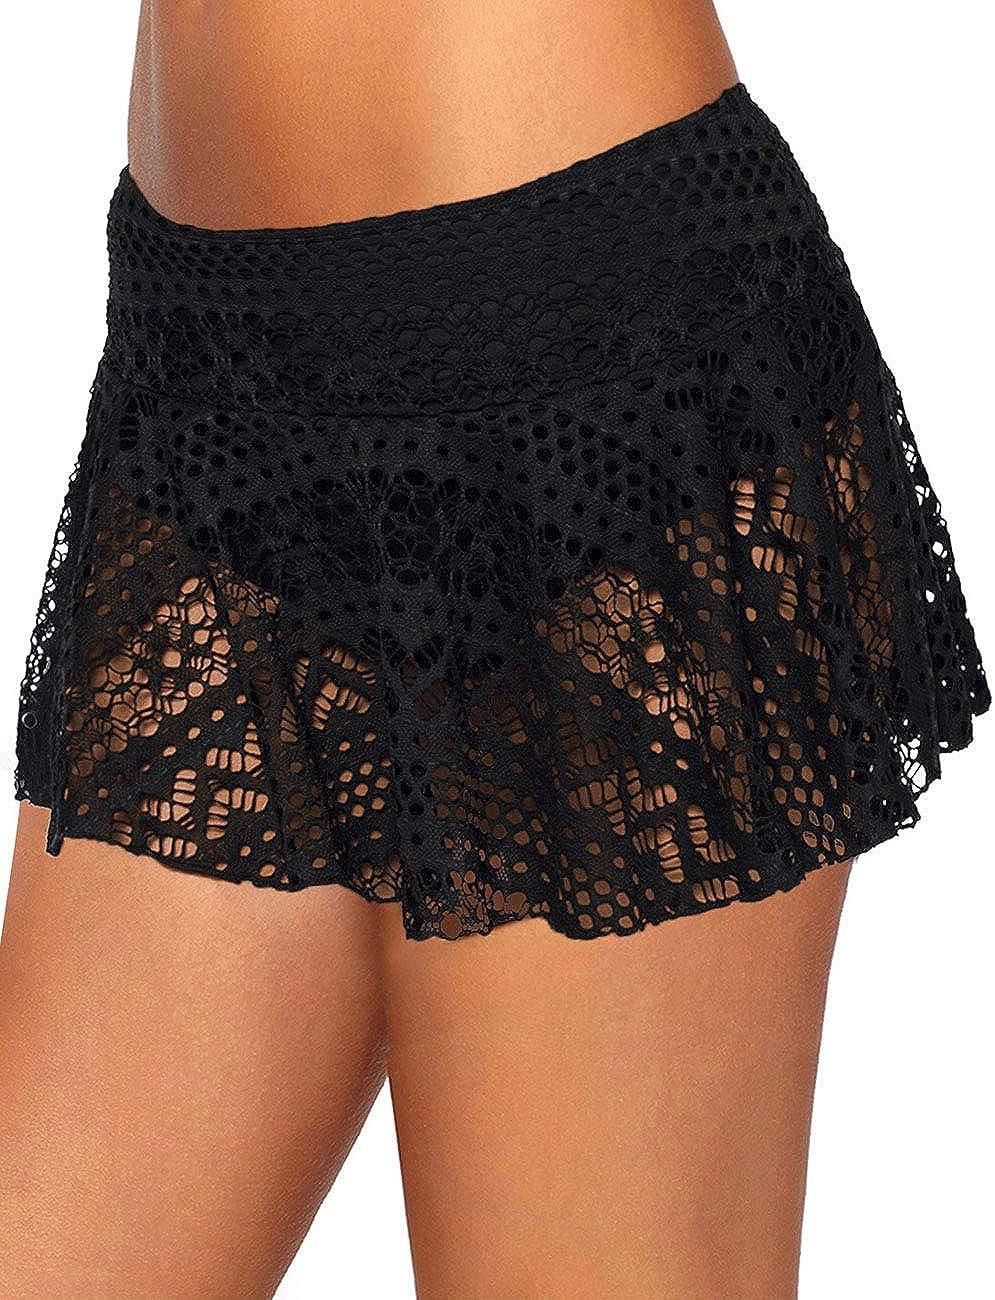 XAKALAKA Women Crochet Lace Bikini Bottom Swim Skirt Solid Swimsuit Short S-XXL